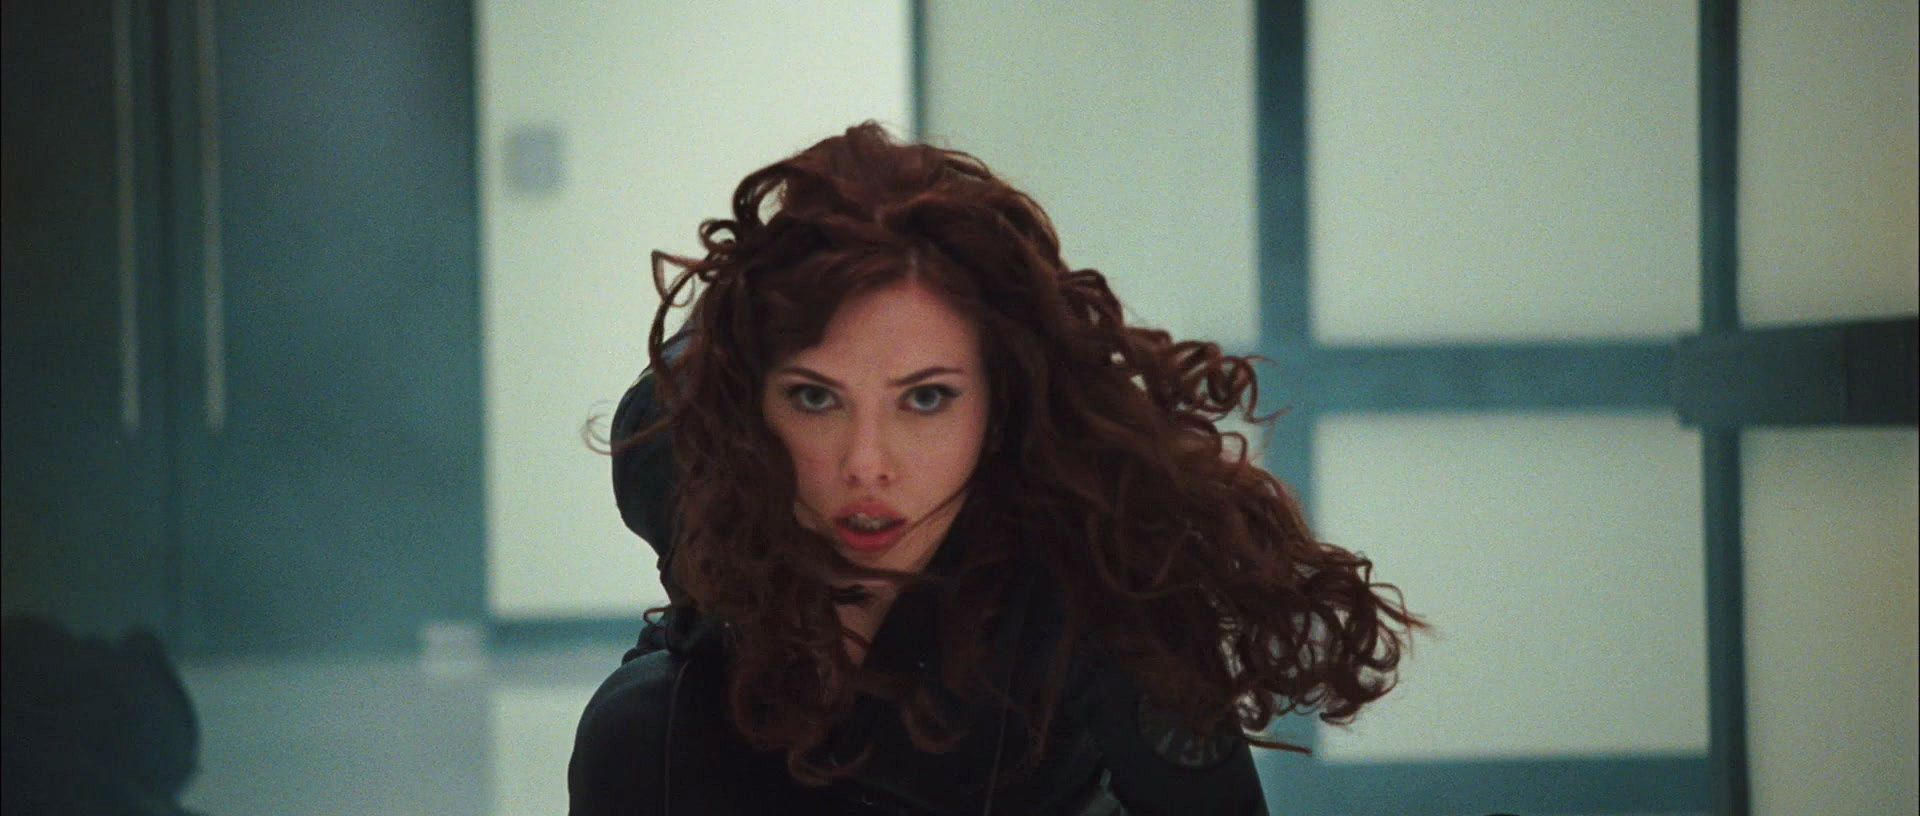 Scarlett Johansson Iron Man 2 Trailer Screencaps